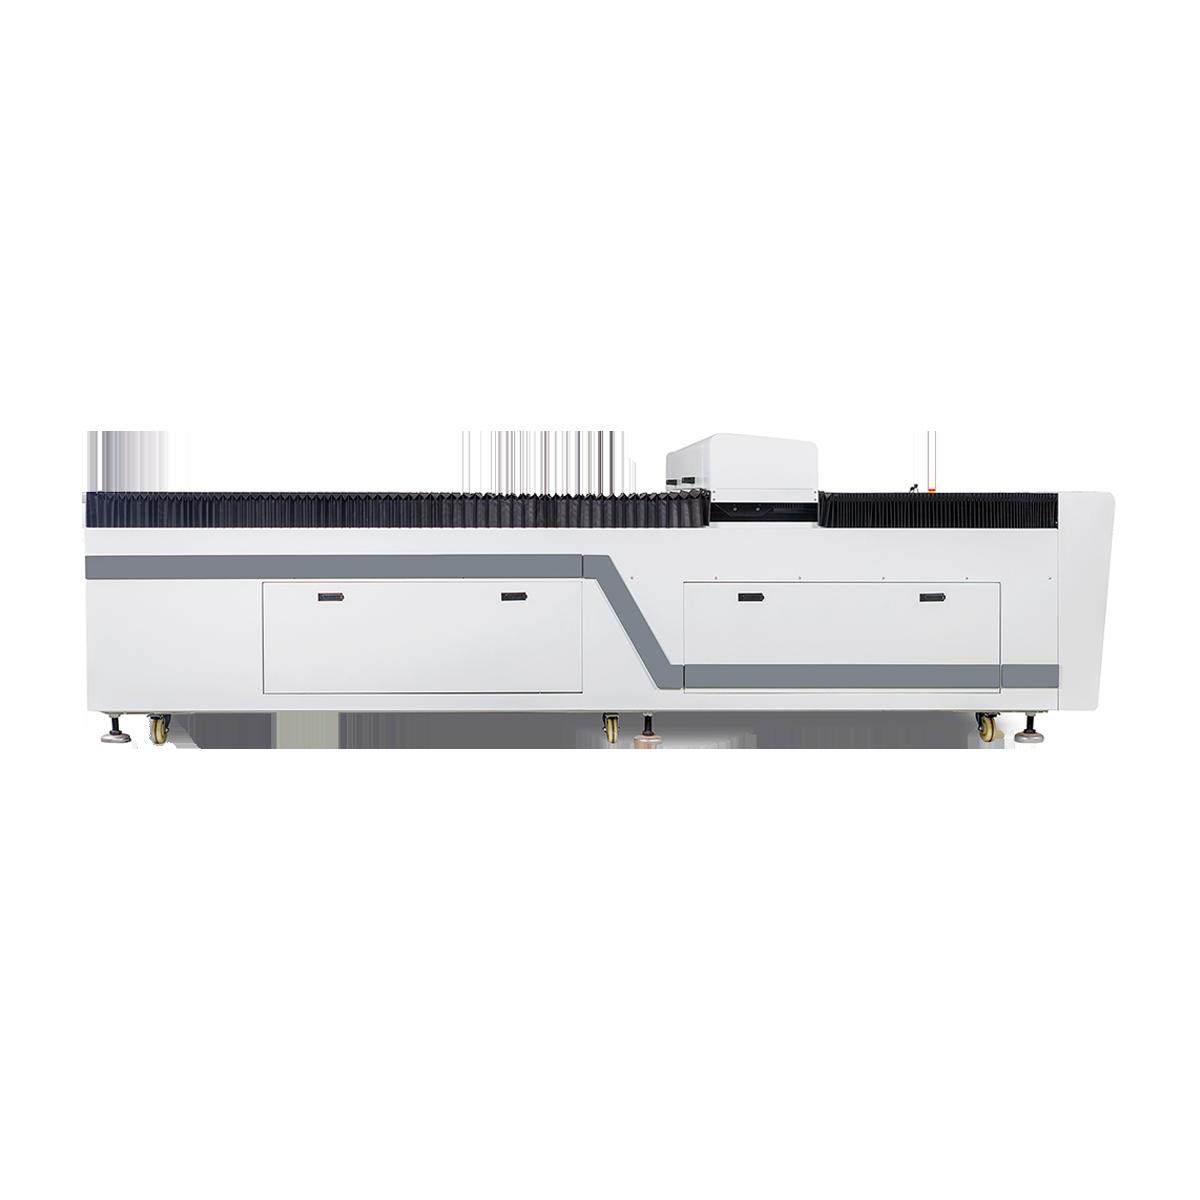 VD1325M-(3)